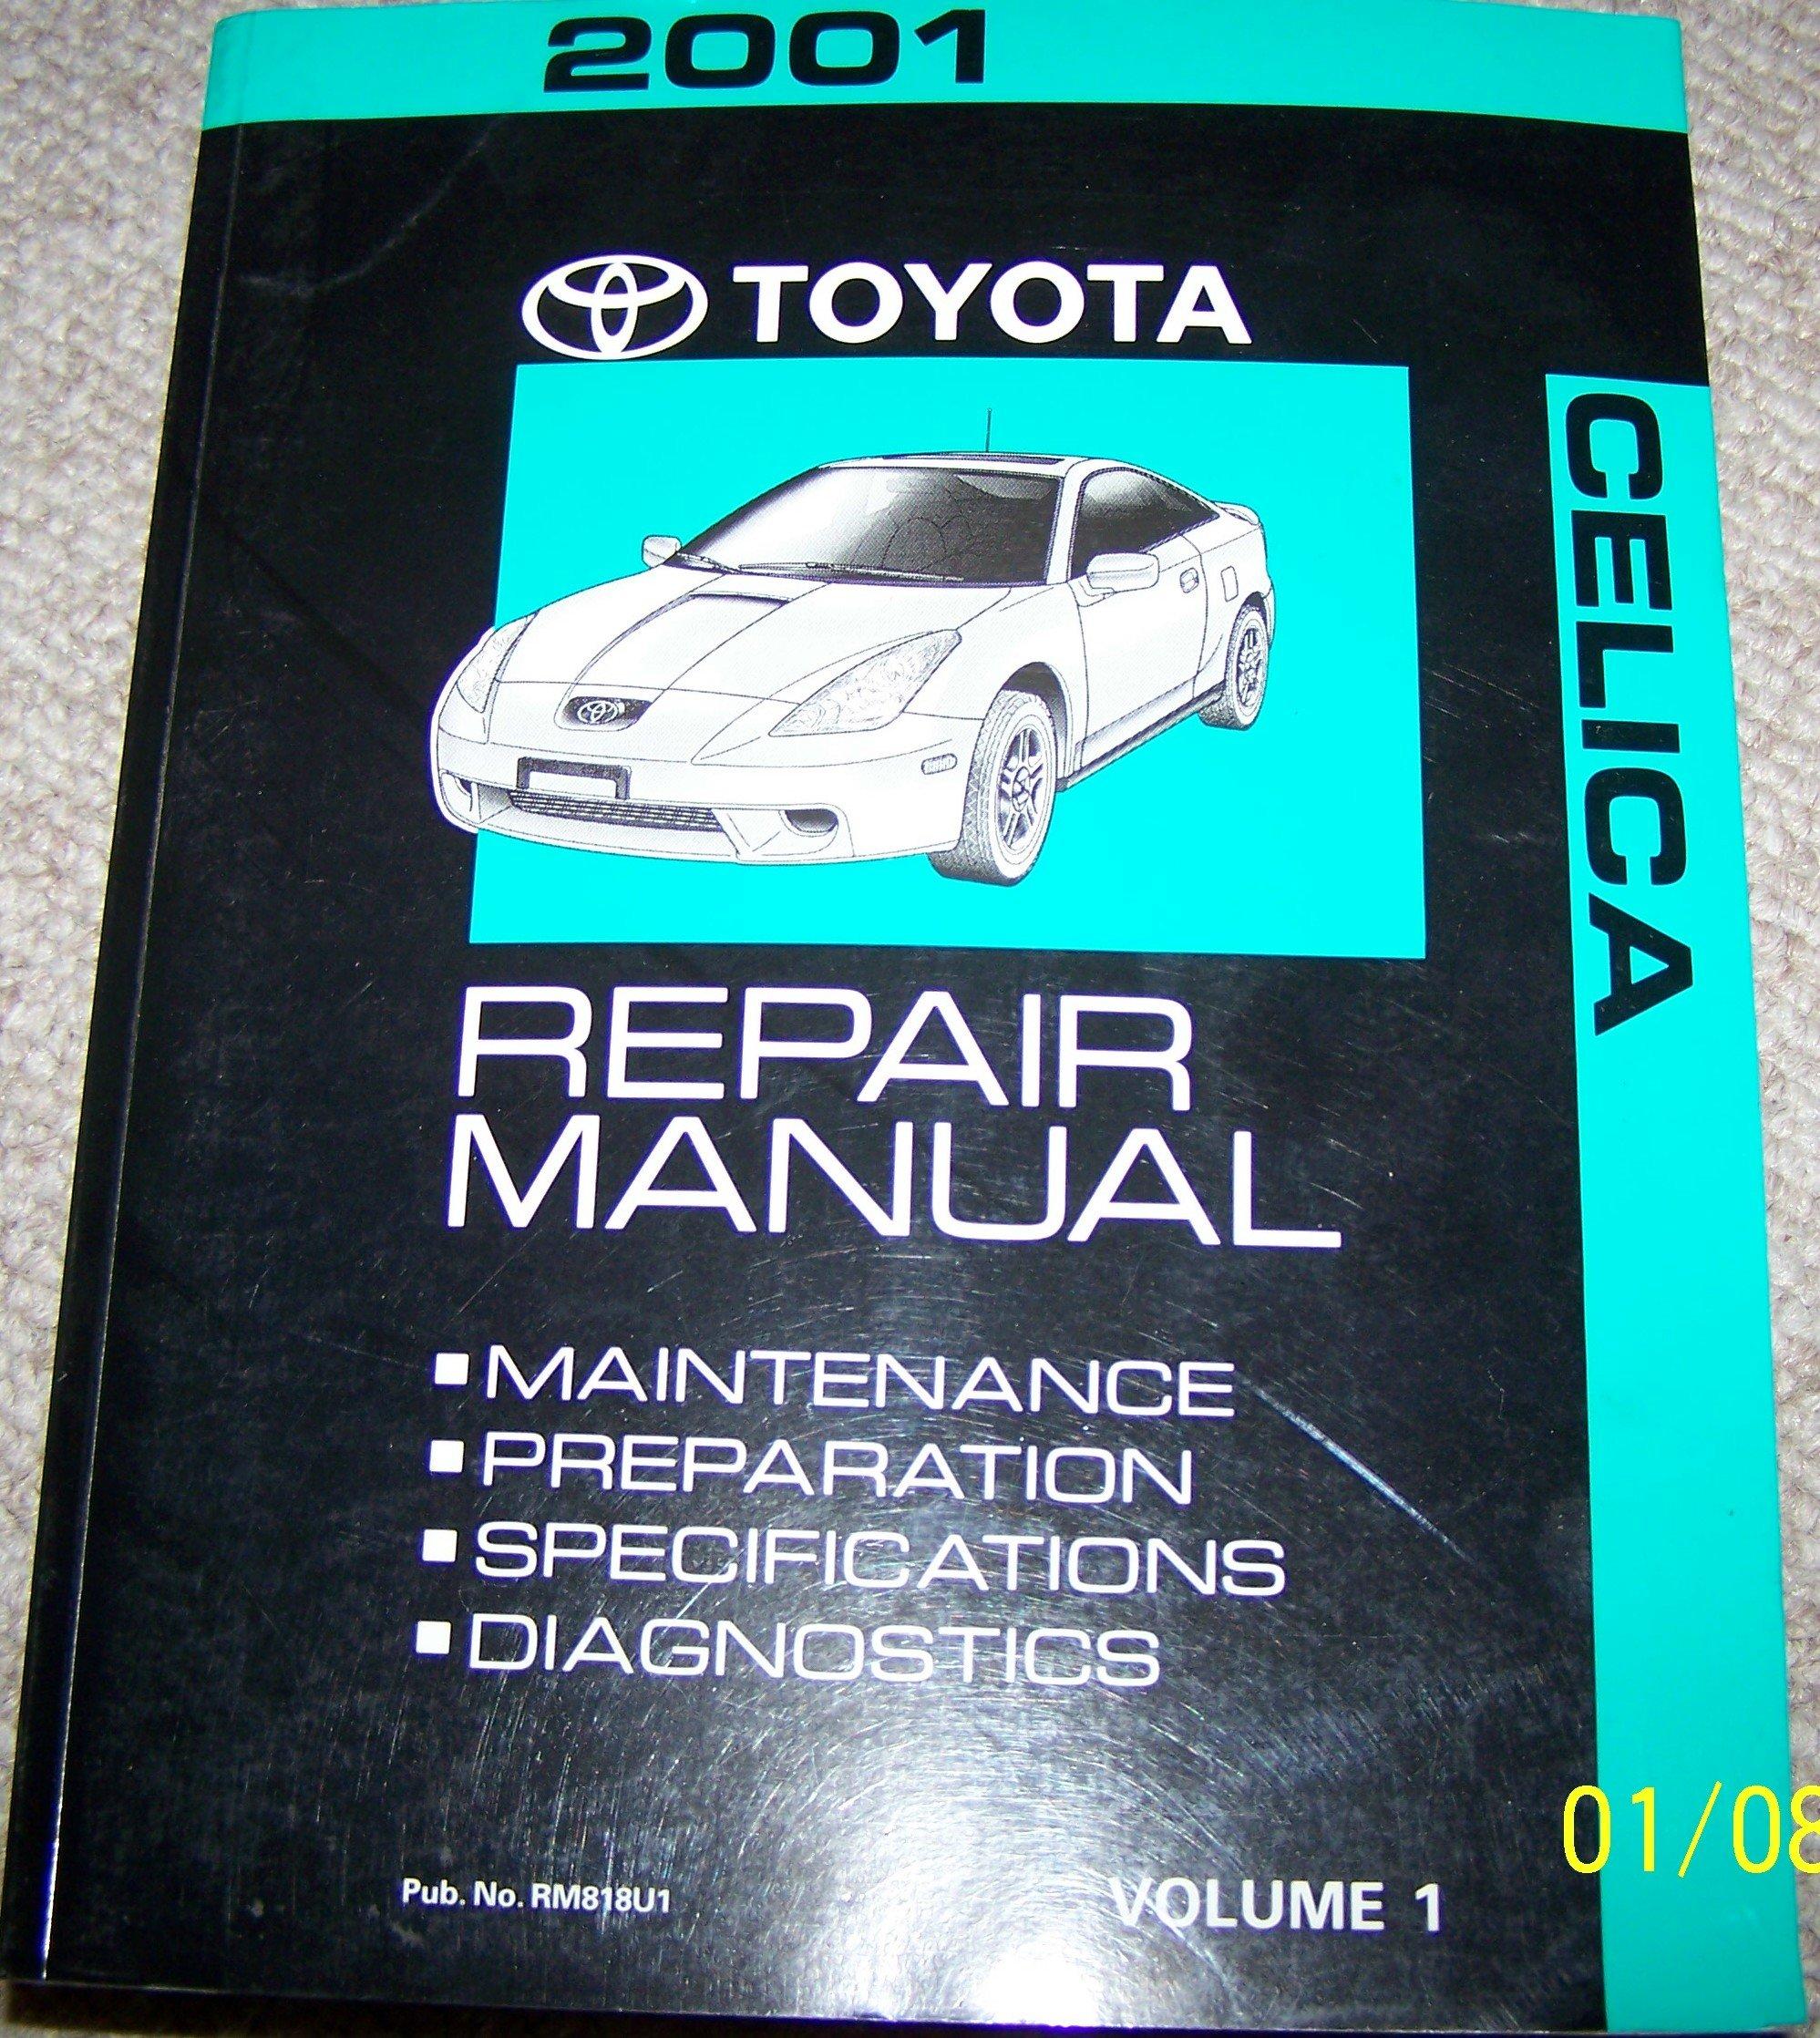 2001 toyota celica service shop repair manual toyota motor corp rh amazon com toyota celica workshop manual free download toyota celica service manual